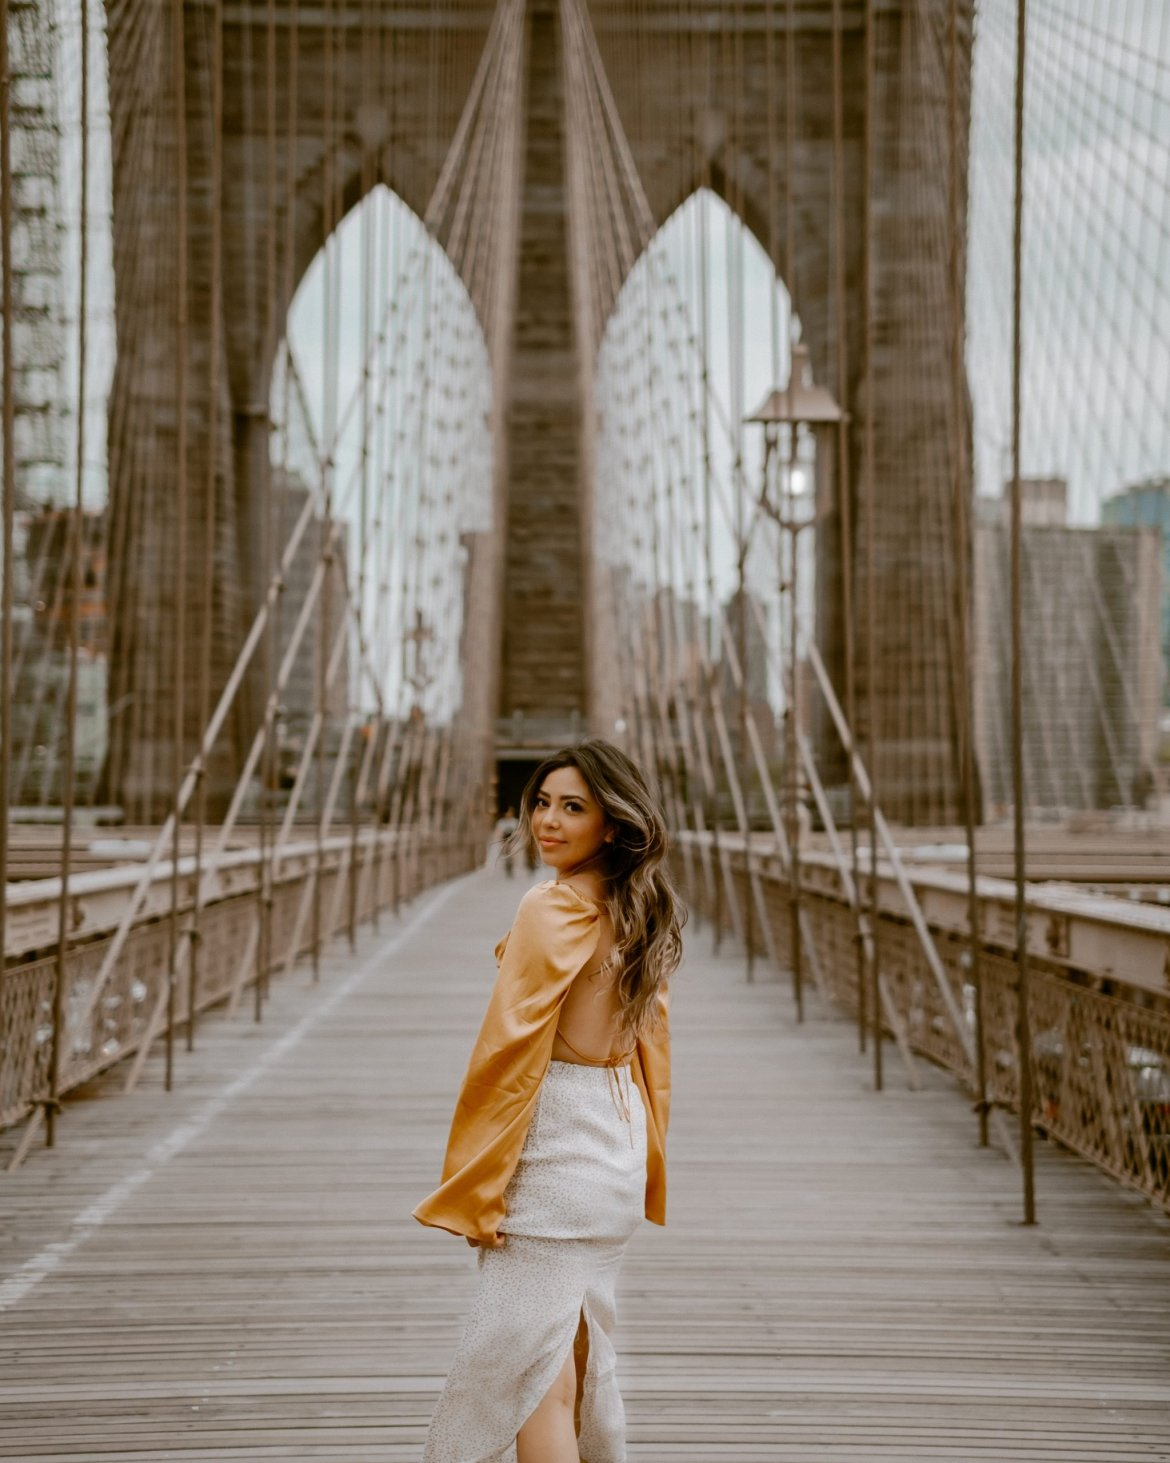 17 Best Instagram Worthy Spots in New York | Brooklyn Bridge